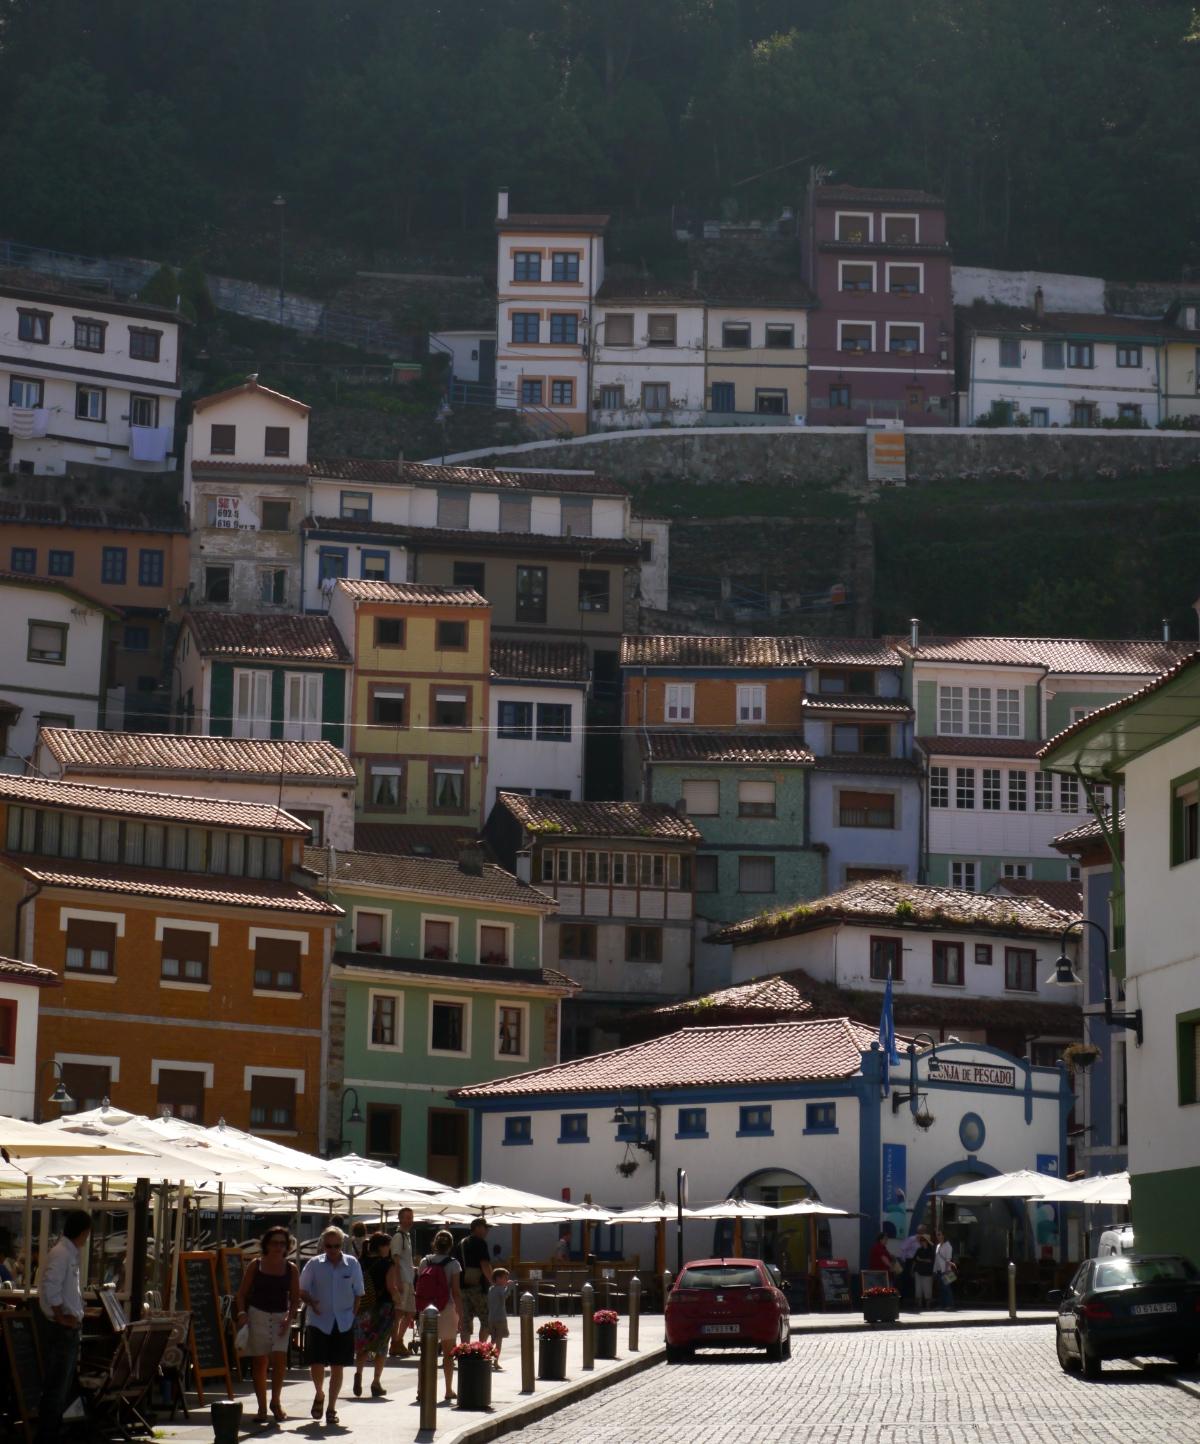 Cudillero, Asturias. 2012